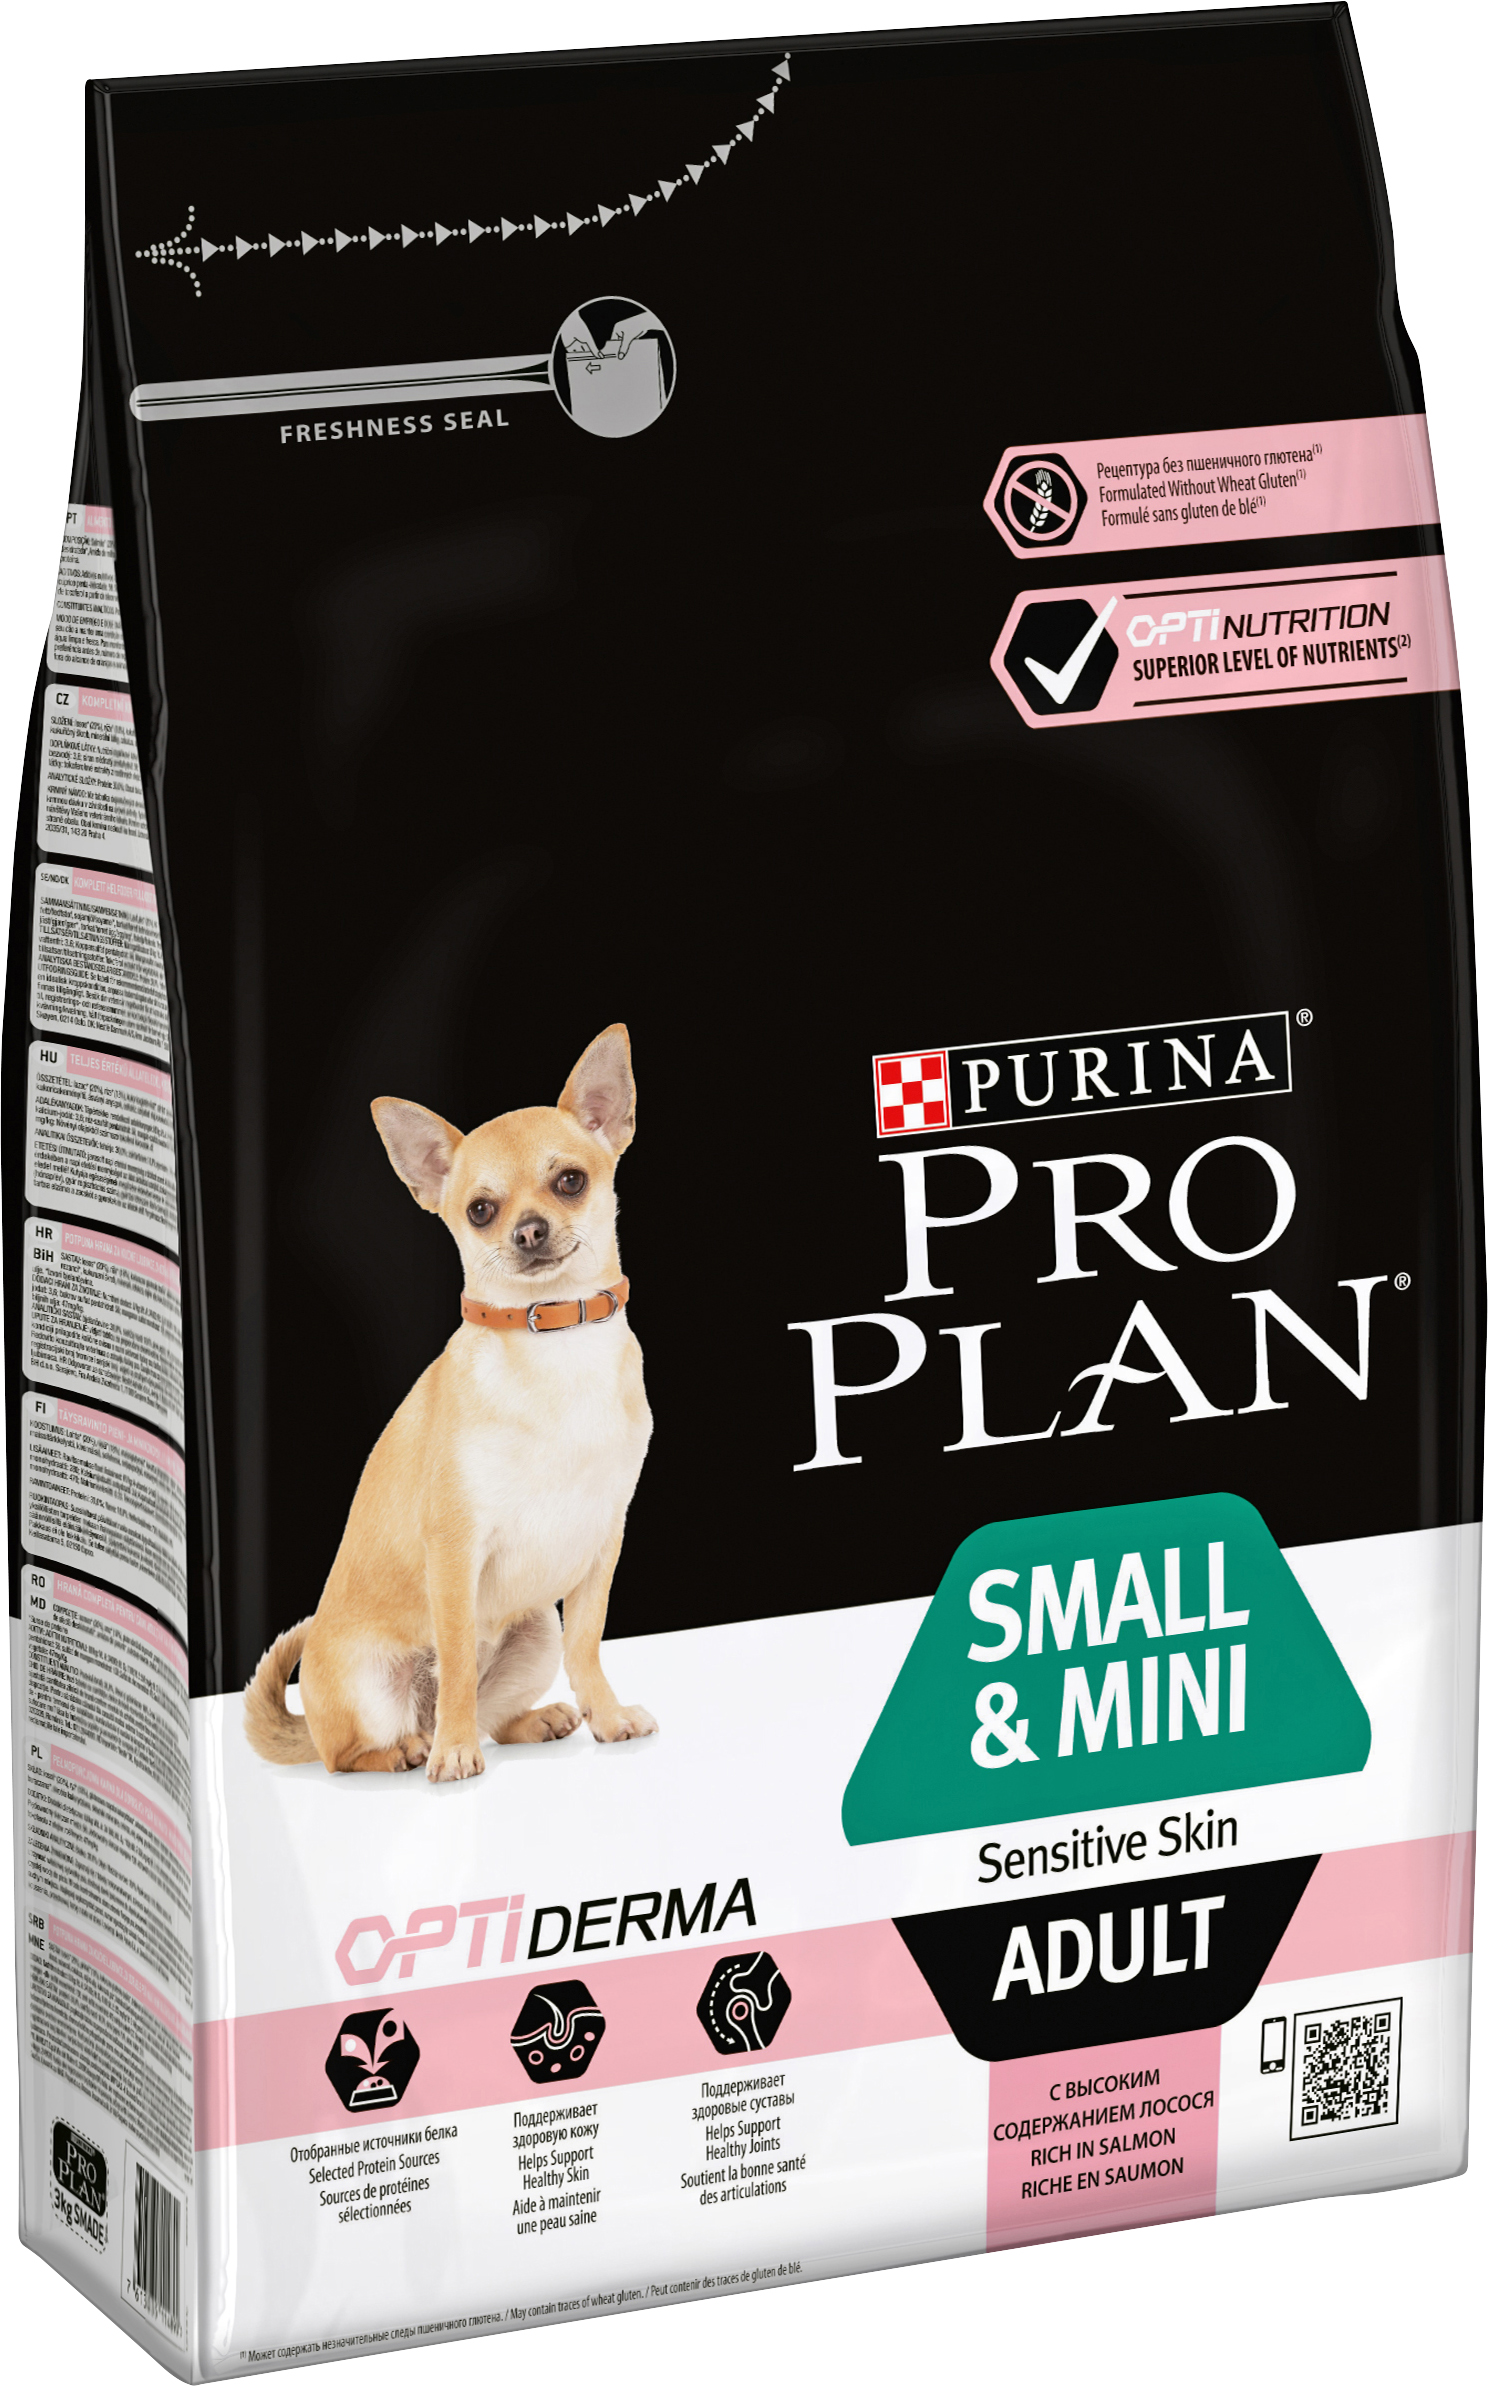 Hundfoder Pro Plan Small & Mini Adult Sensitive Skin, 3 kg